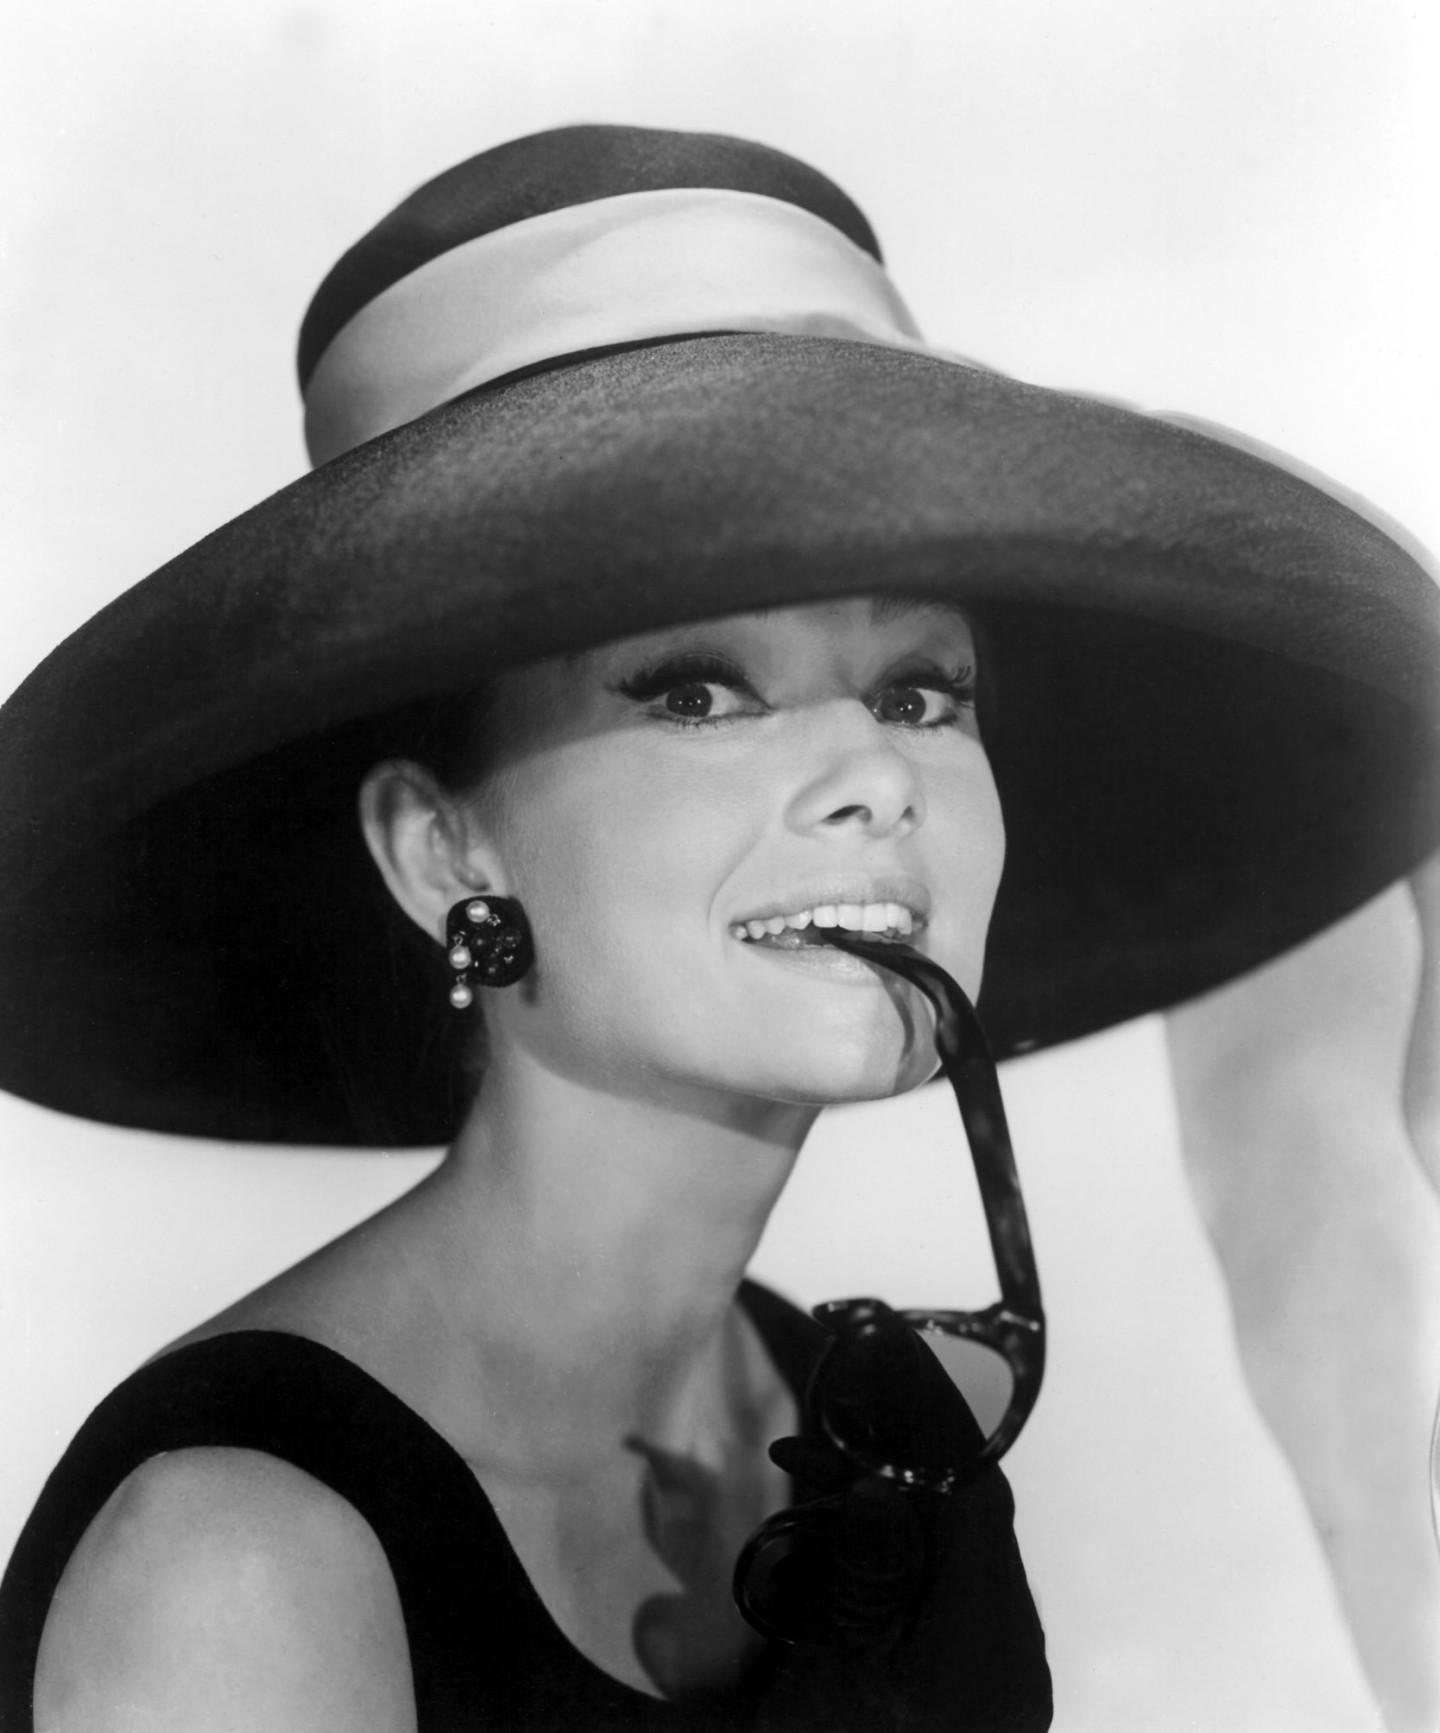 Audrey-Hepburn-sabrina-cappello-falde-larghe-chic-elegante-valentina-coco-fashion-blogger